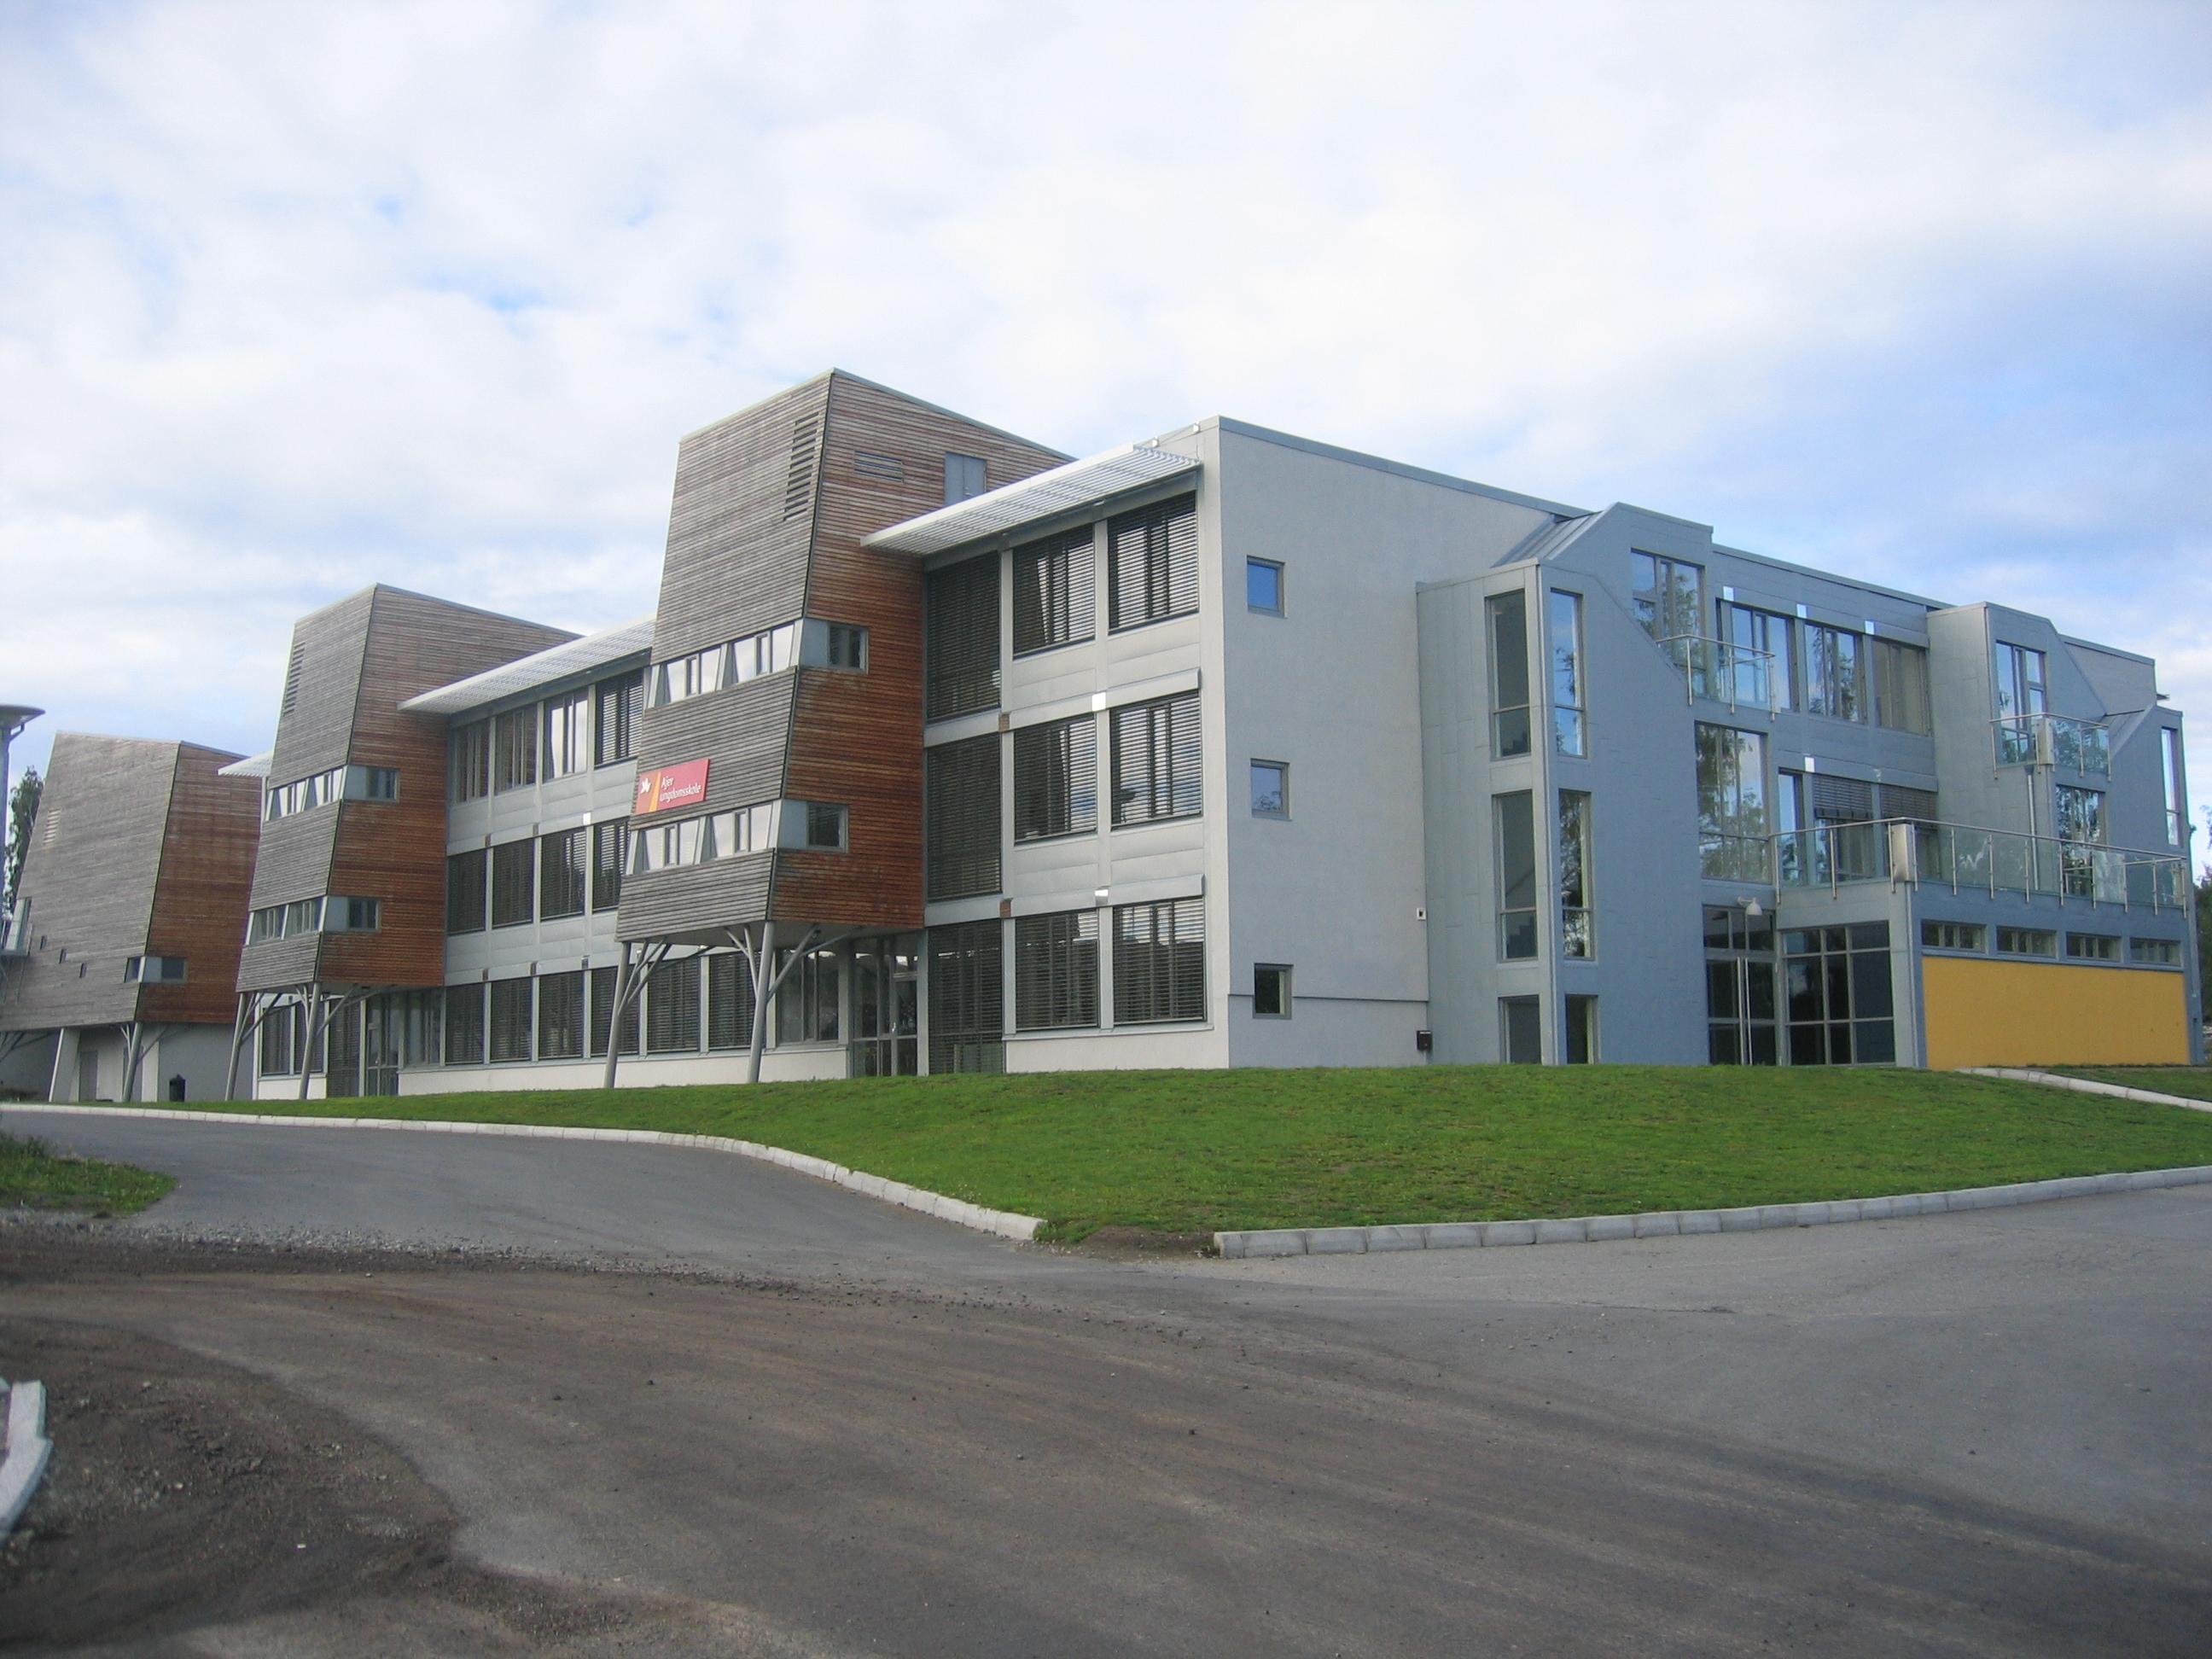 3c348d79 Ajer ungdomsskole – Wikipedia